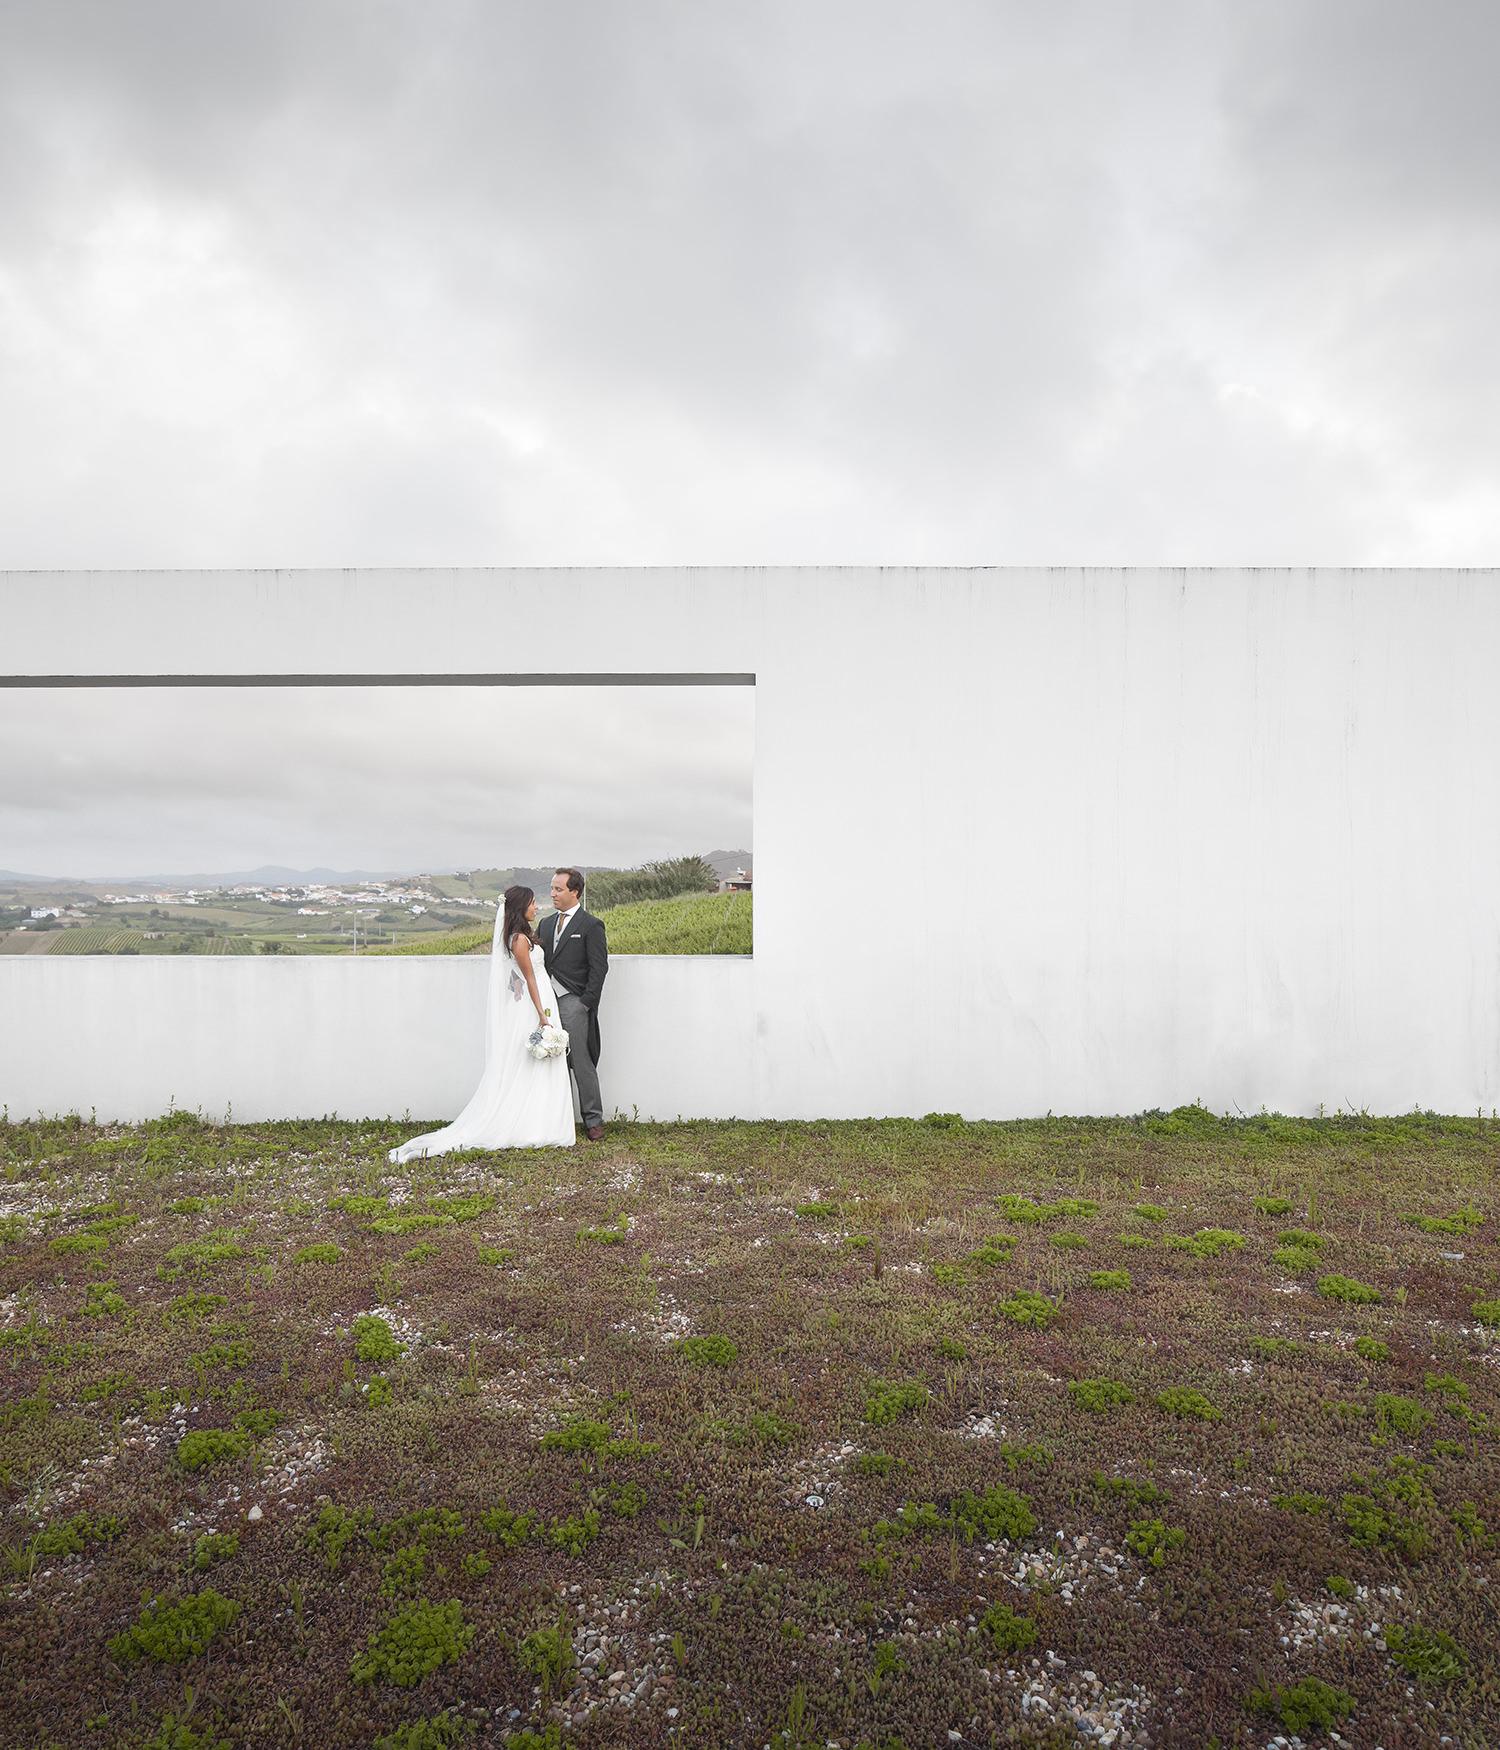 areias-seixo-wedding-photographer-terra-fotografia-159.jpg